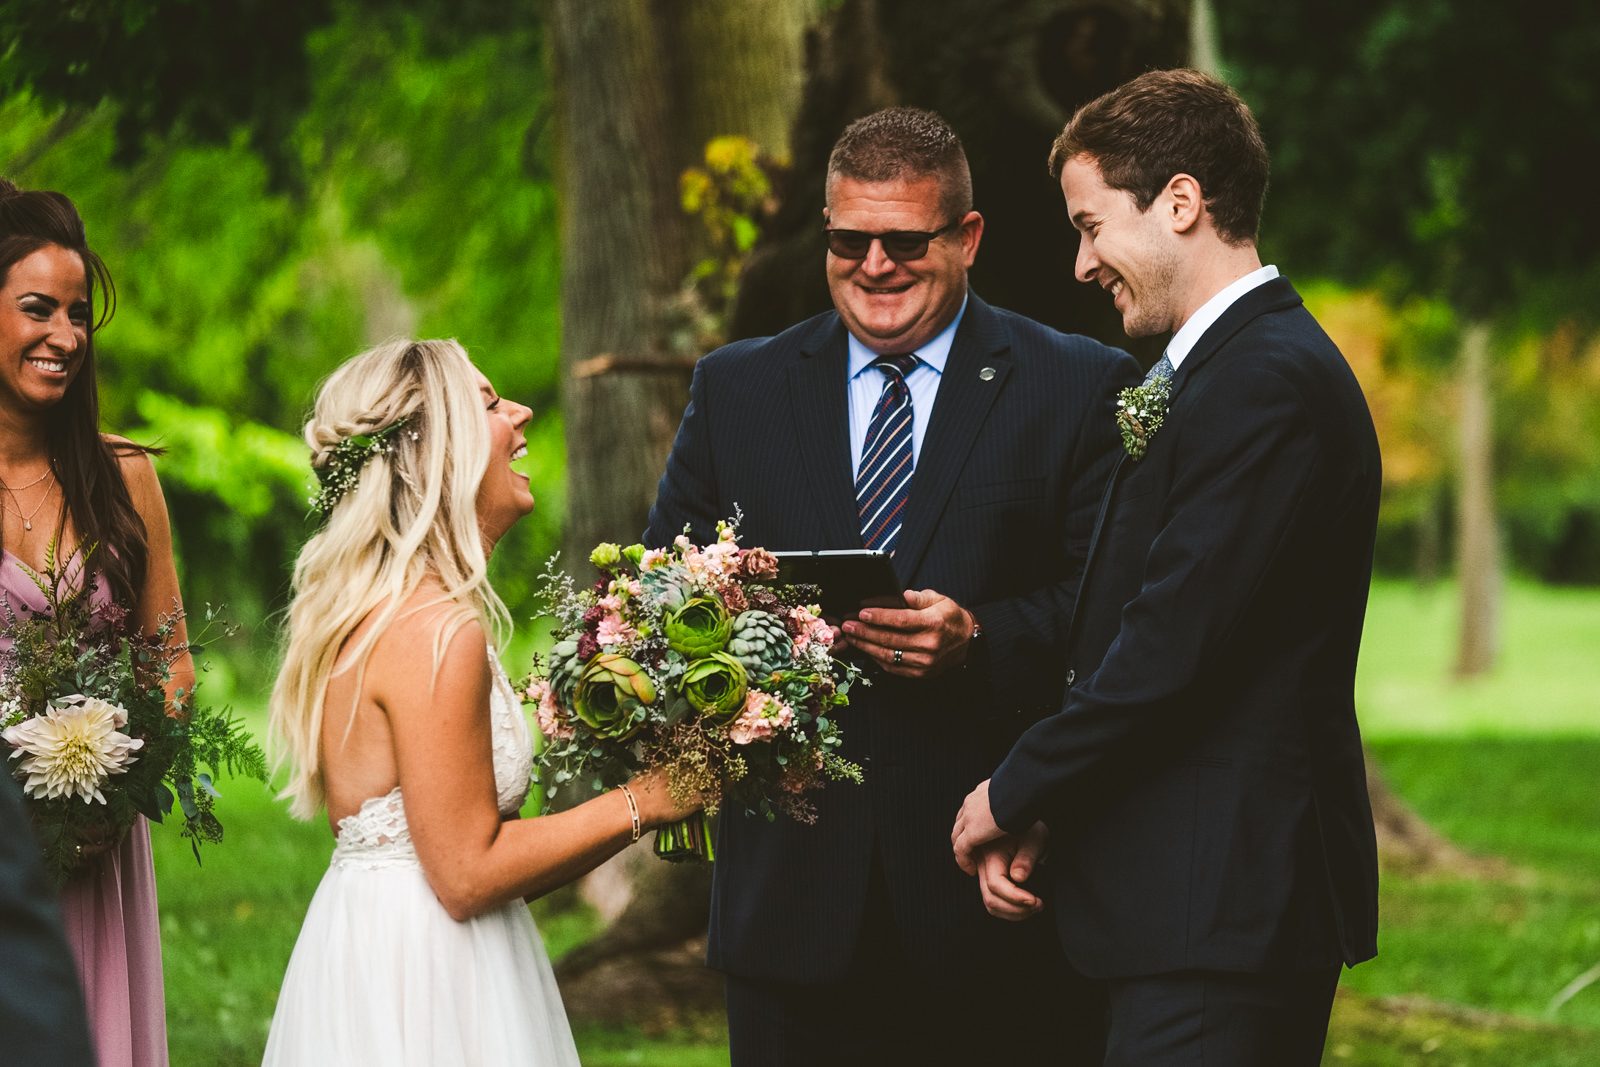 Outdoor Wedding at Gervasi Vineyard with Toledo Ohio Wedding Photographers in Cleveland